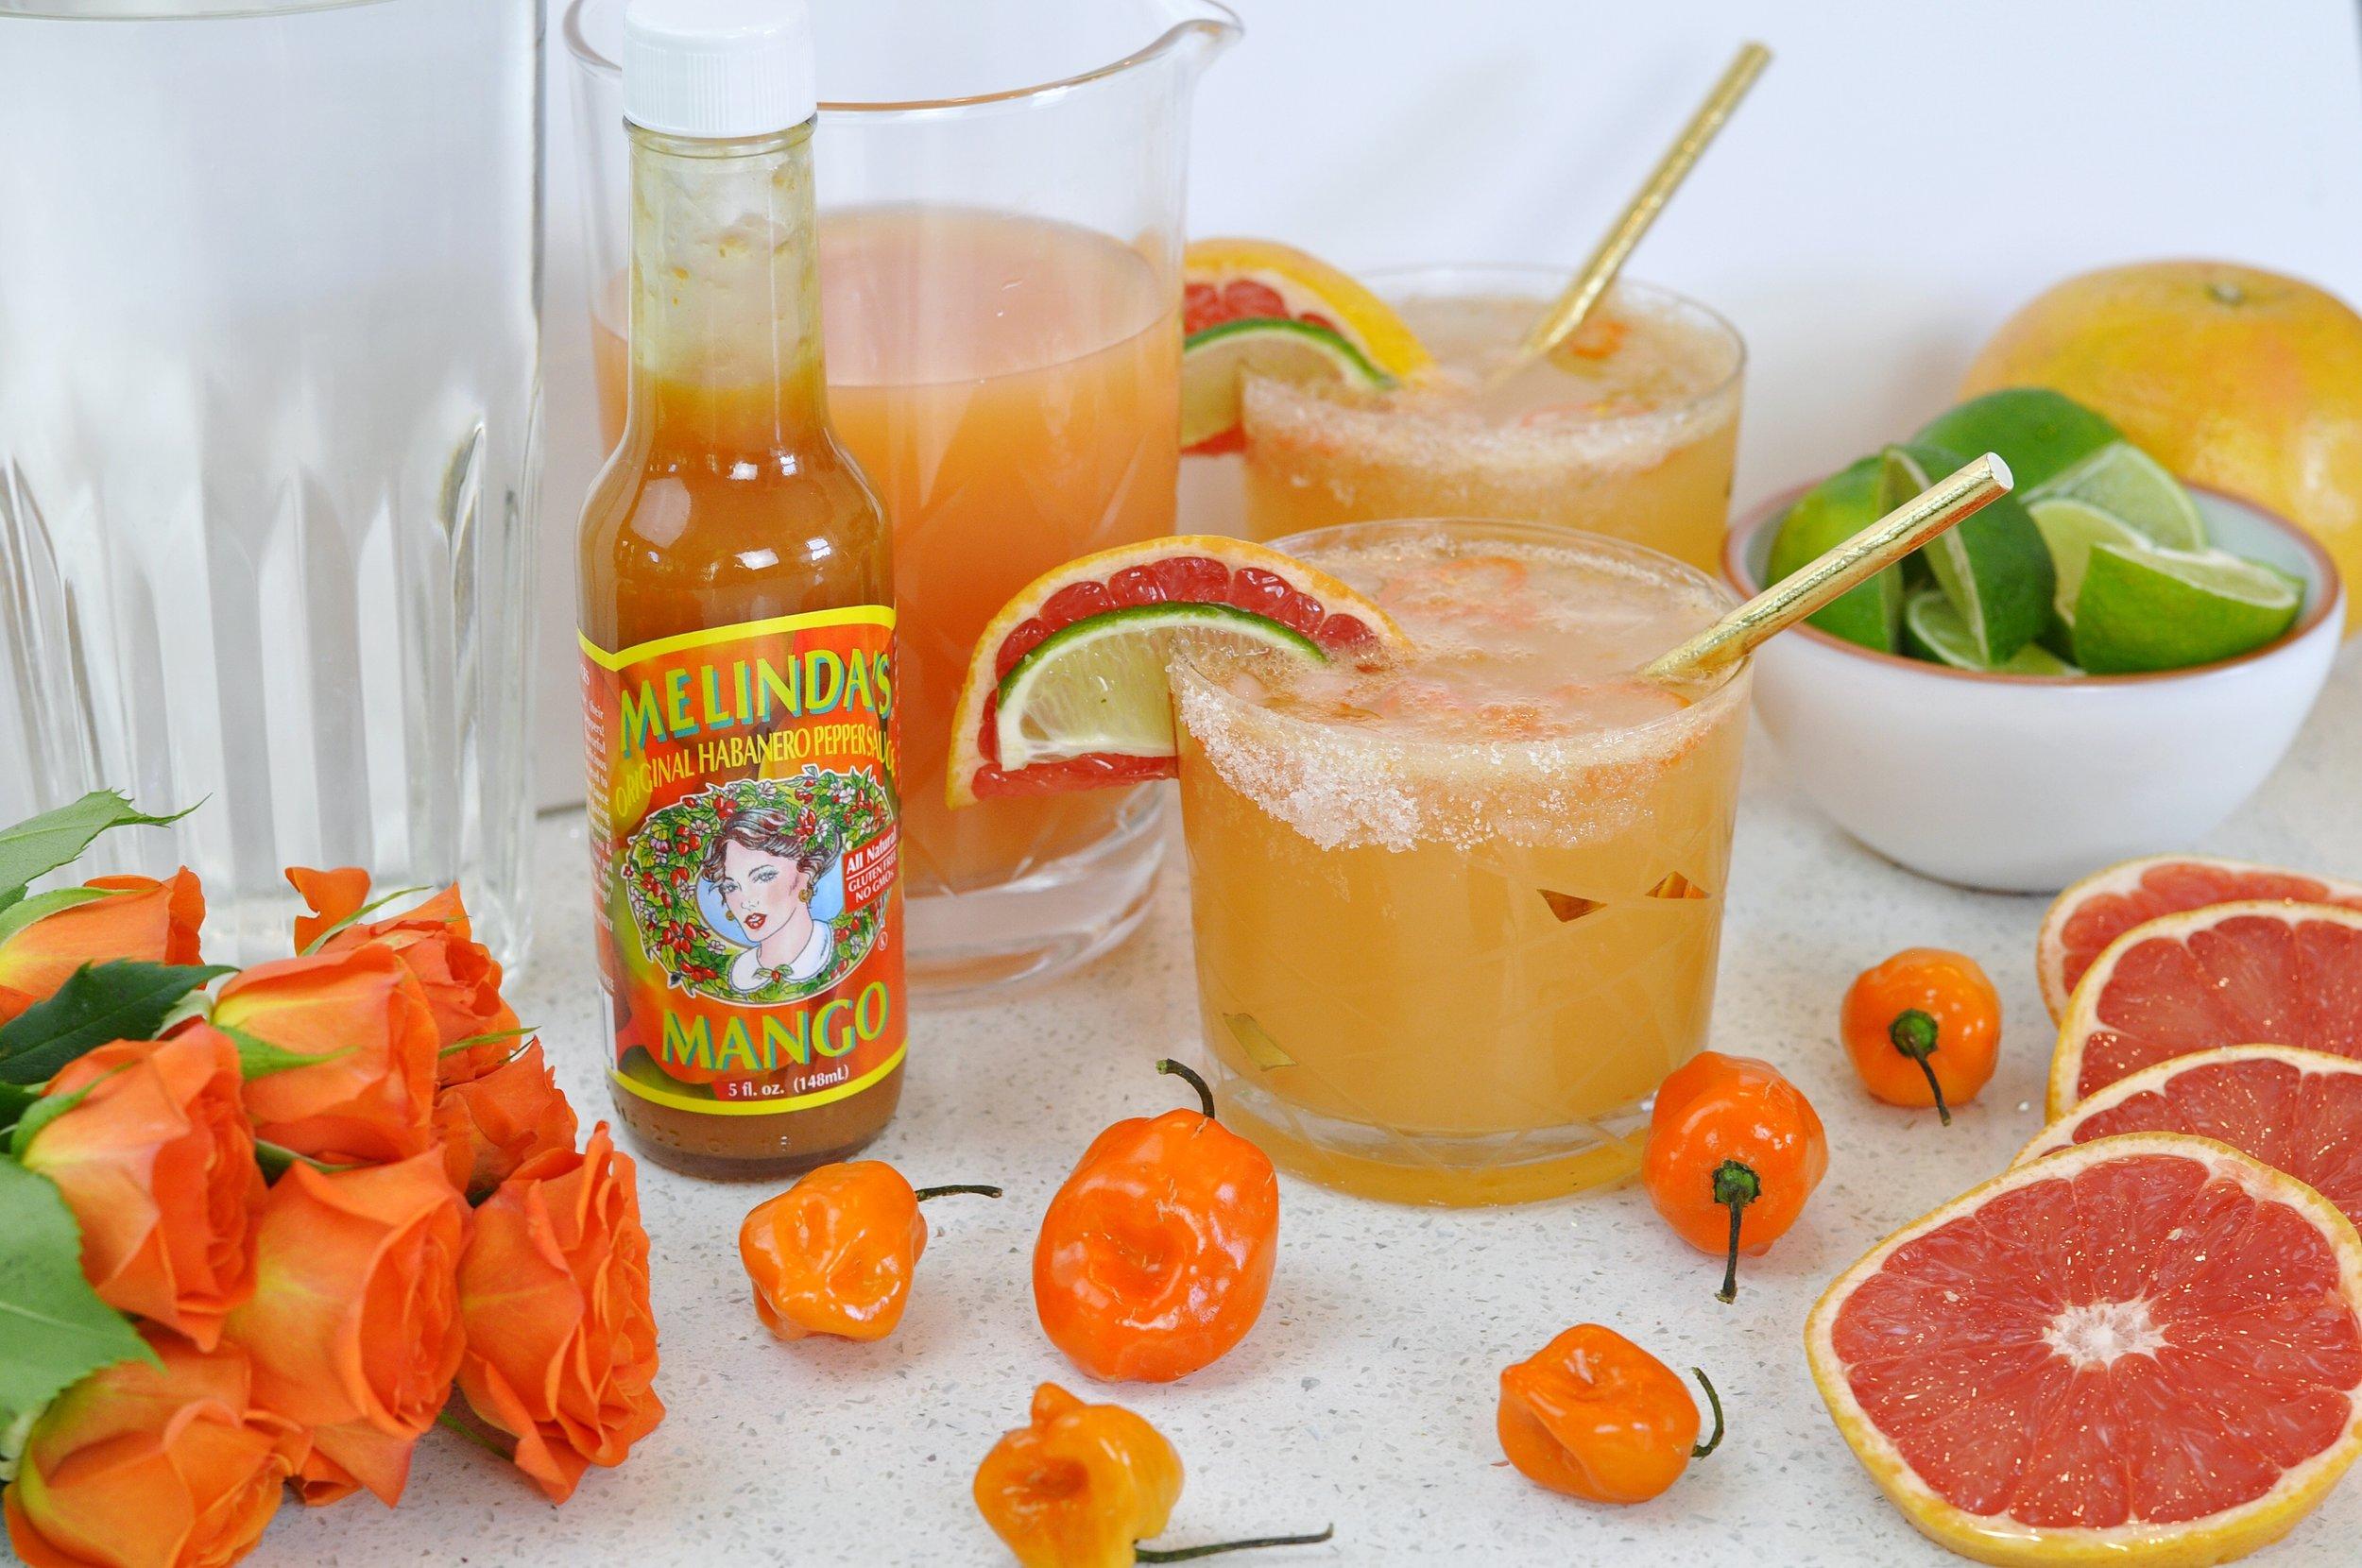 Spicy Paloma Cocktail Recipe with Mango Habanero | coupleinthekitchen.com